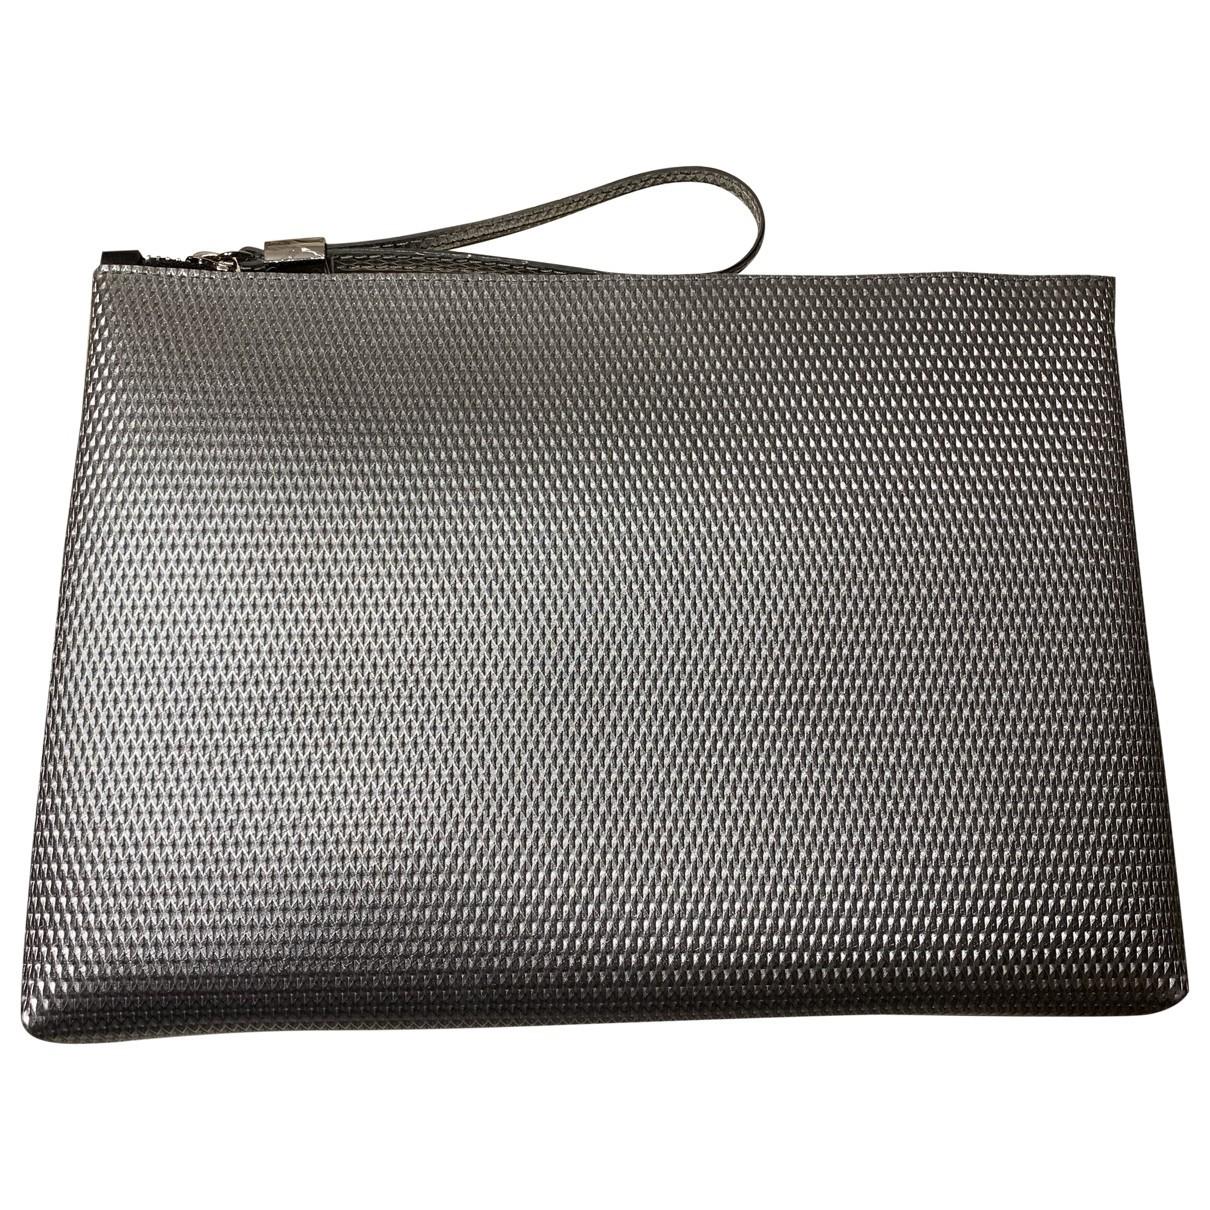 Gianni Chiarini \N Handtasche in  Silber Synthetik